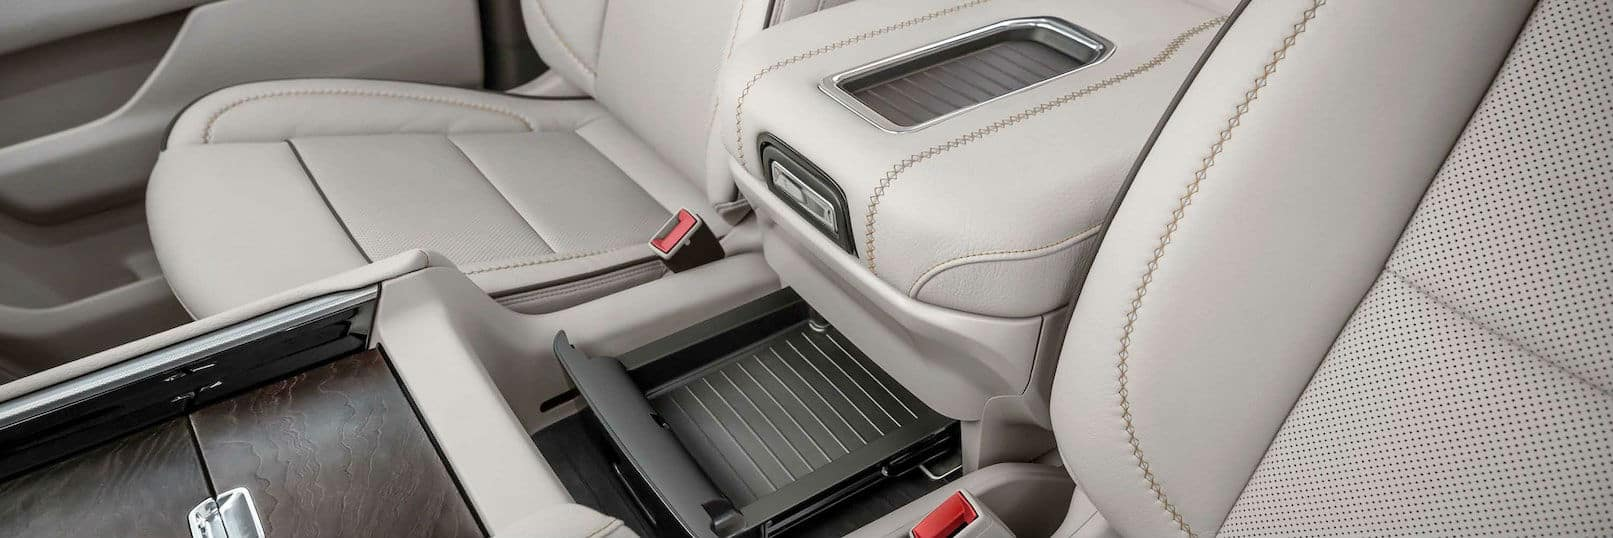 2021 GMC Yukon Denali Interior Cabin Front Seating Center Console